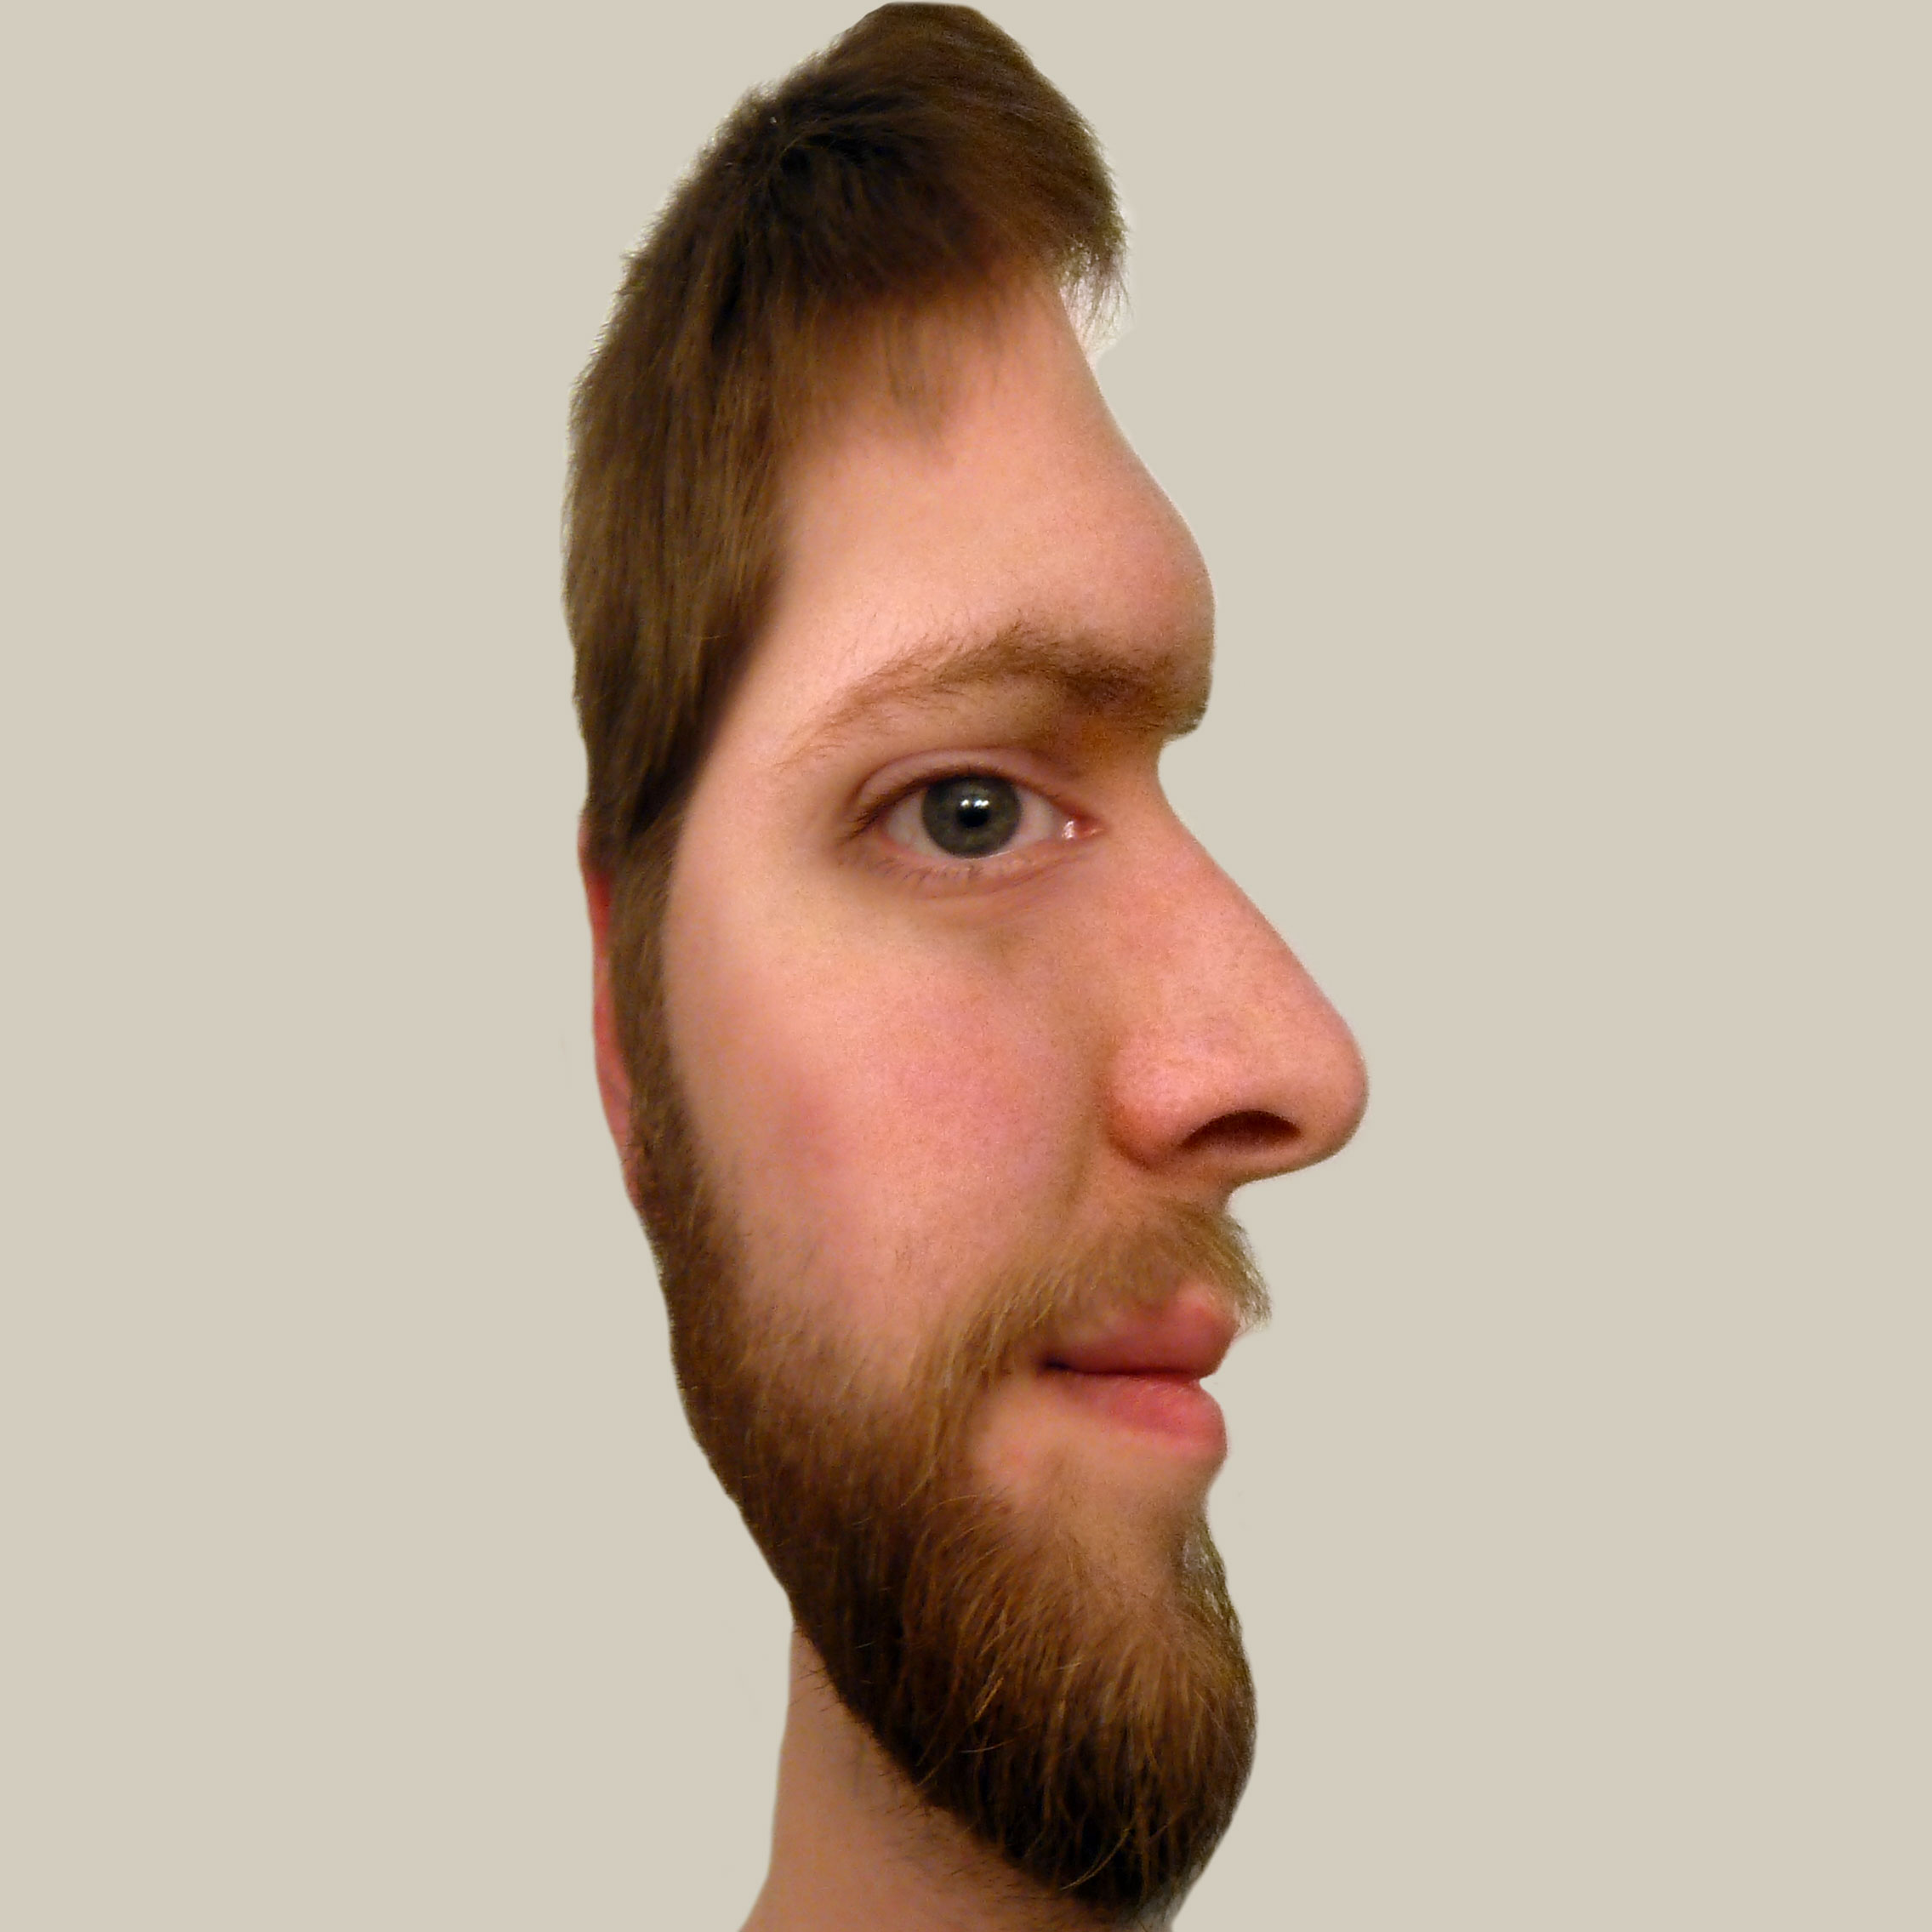 face_illusion2